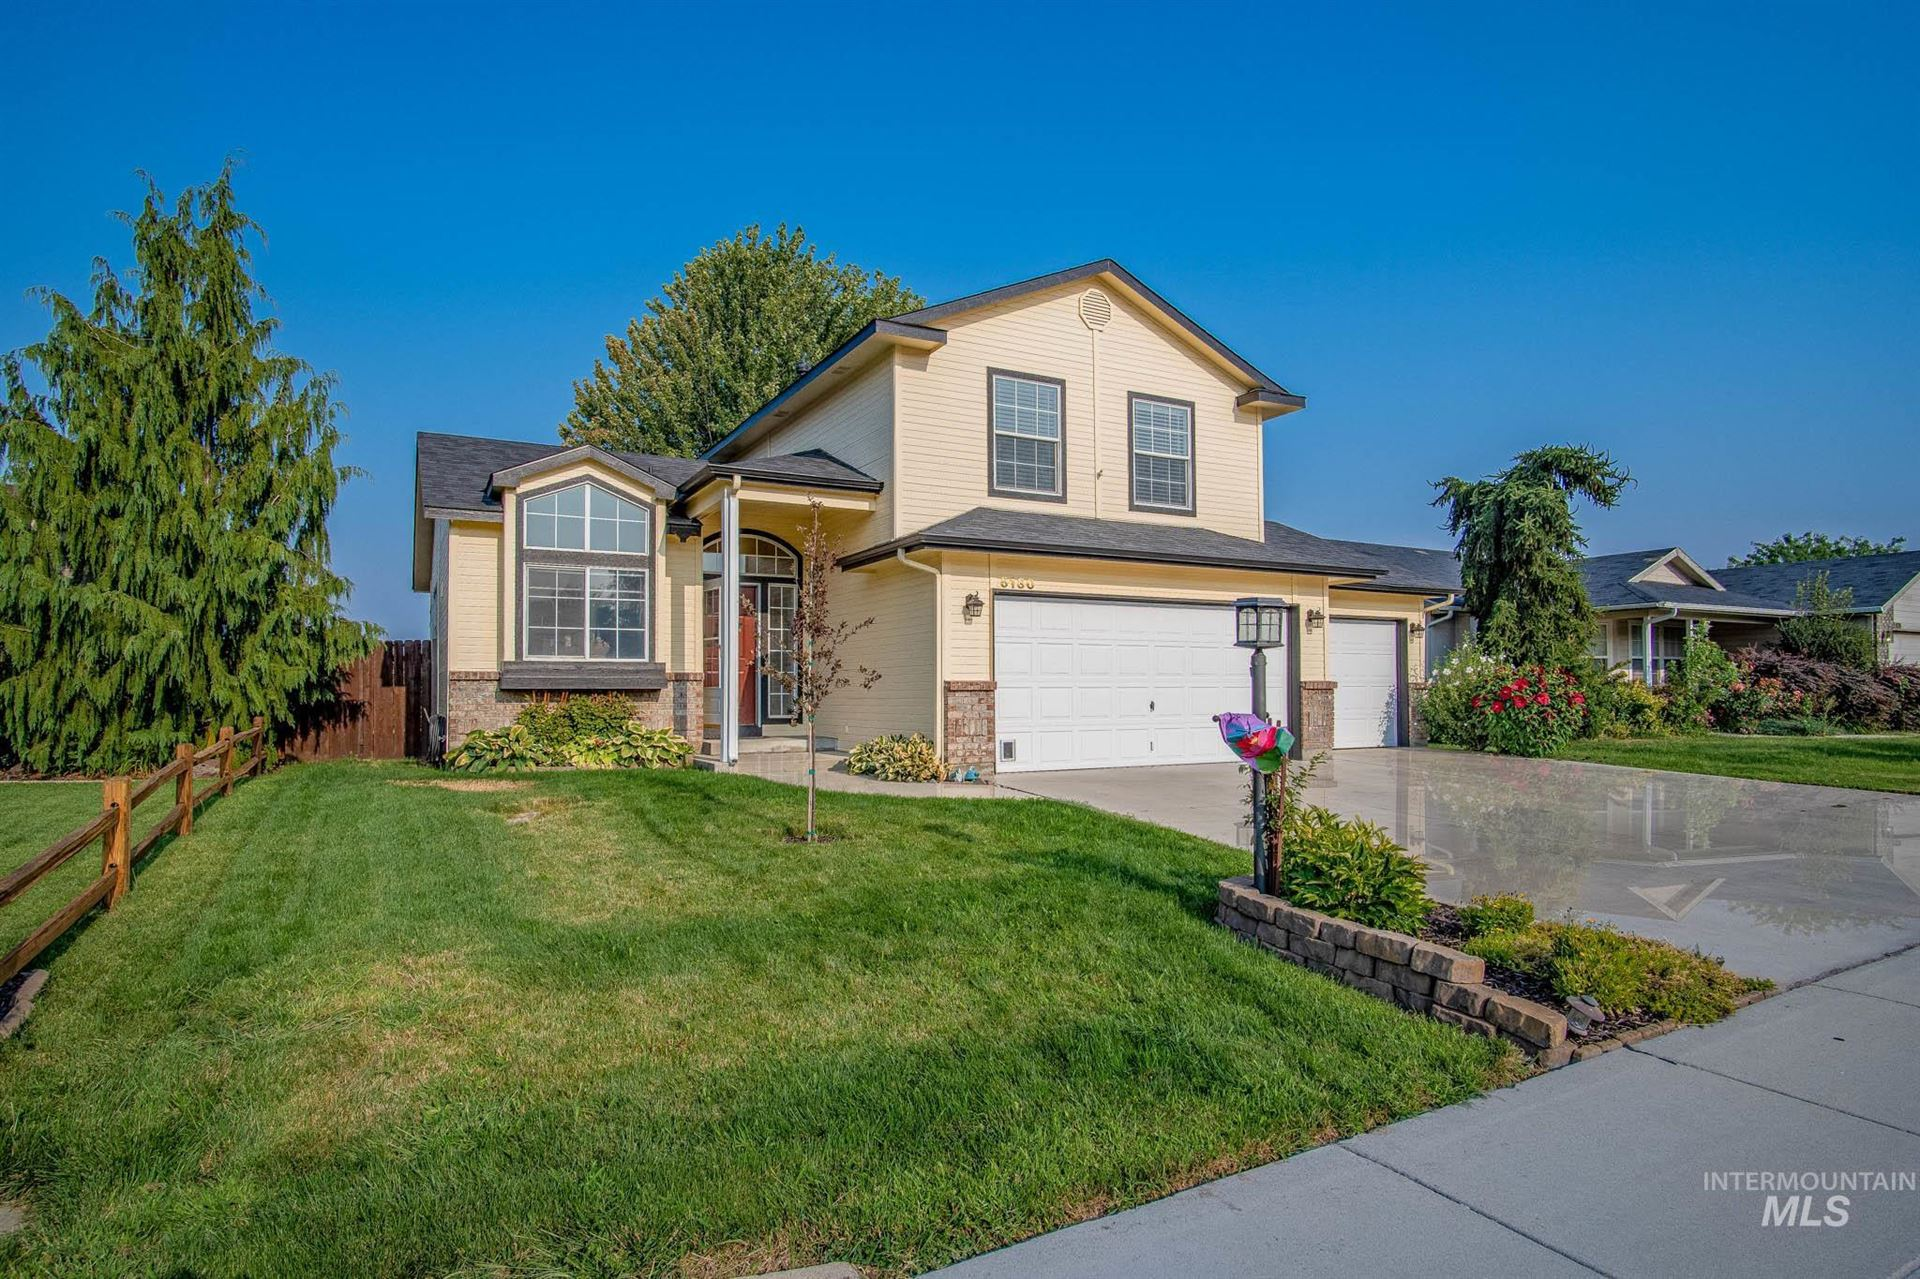 5130 N Rothmans Ave, Boise, ID 83713 - MLS#: 98815632